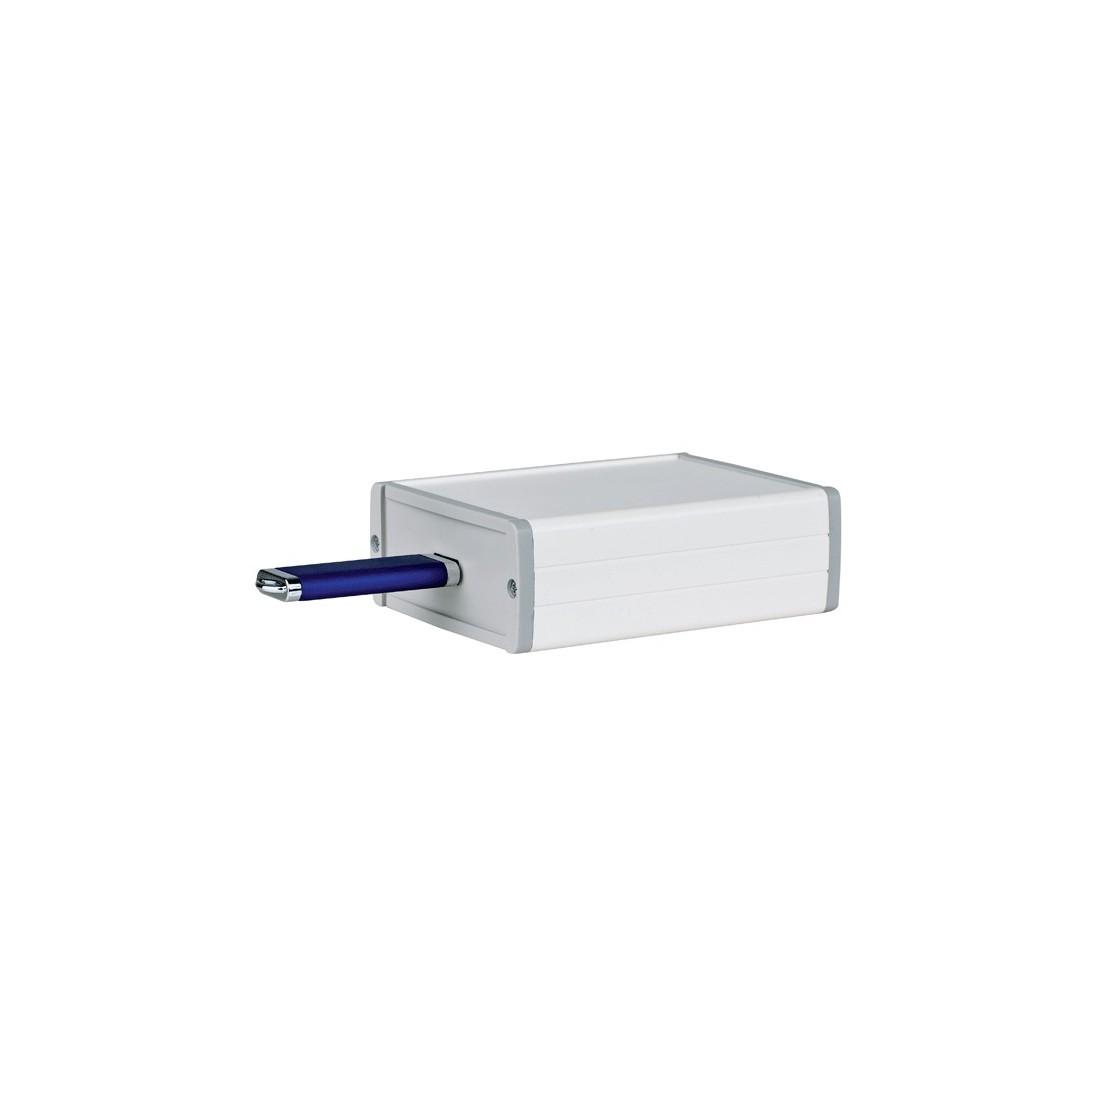 DataLogger USB